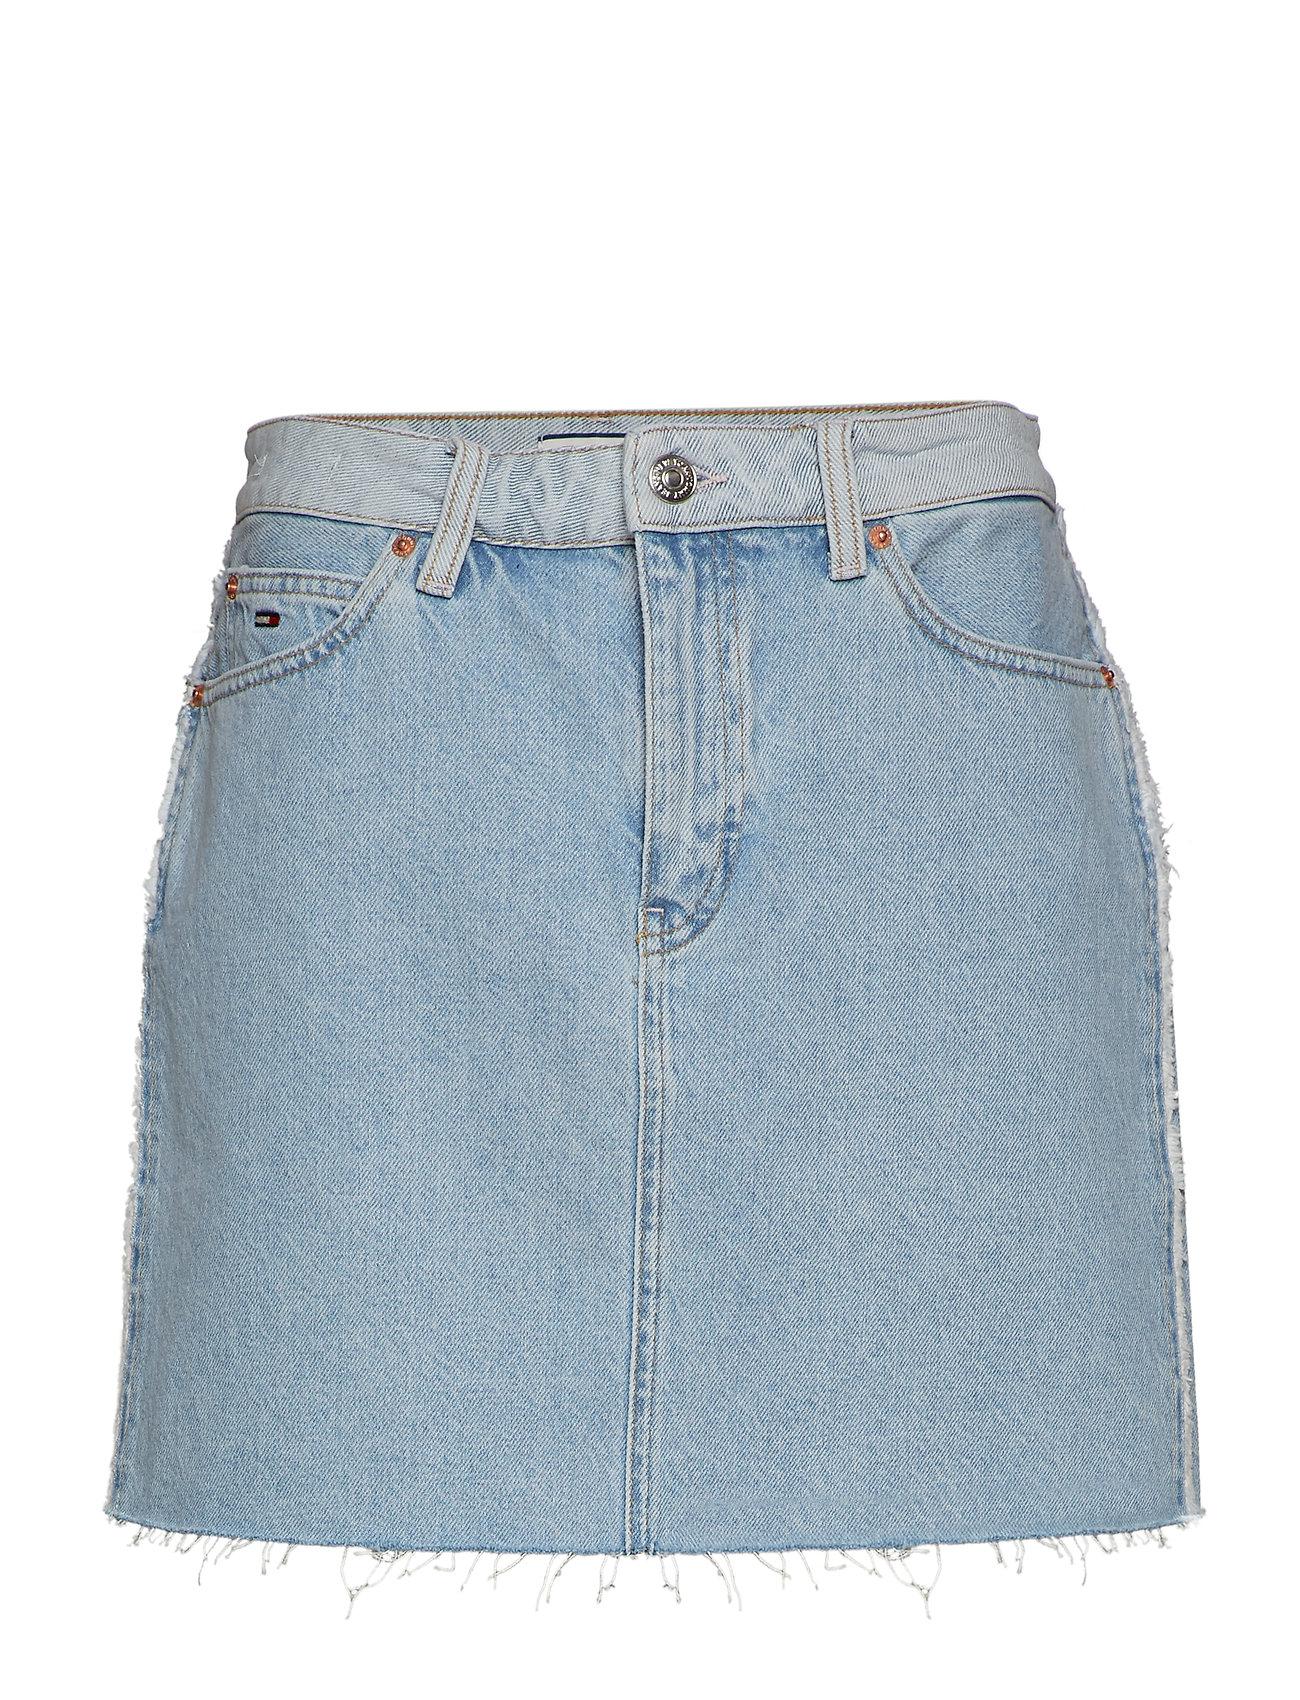 Tommy Jeans SHORT DENIM SKIRT BRGHTL - BRIGHT LIGHT BL RIG